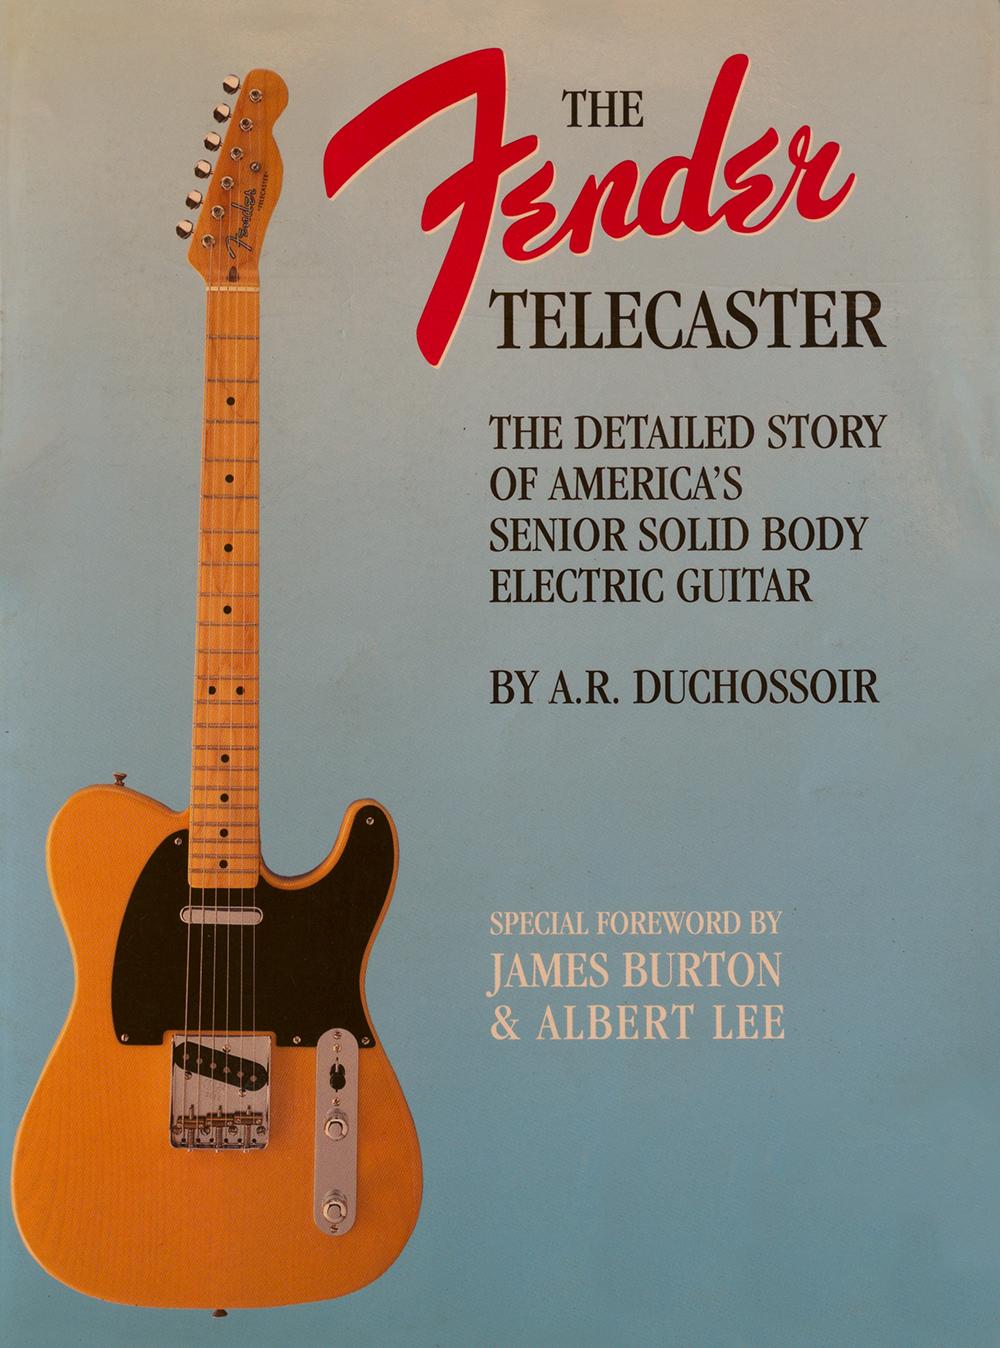 fender telecaster, by andre duchossoir